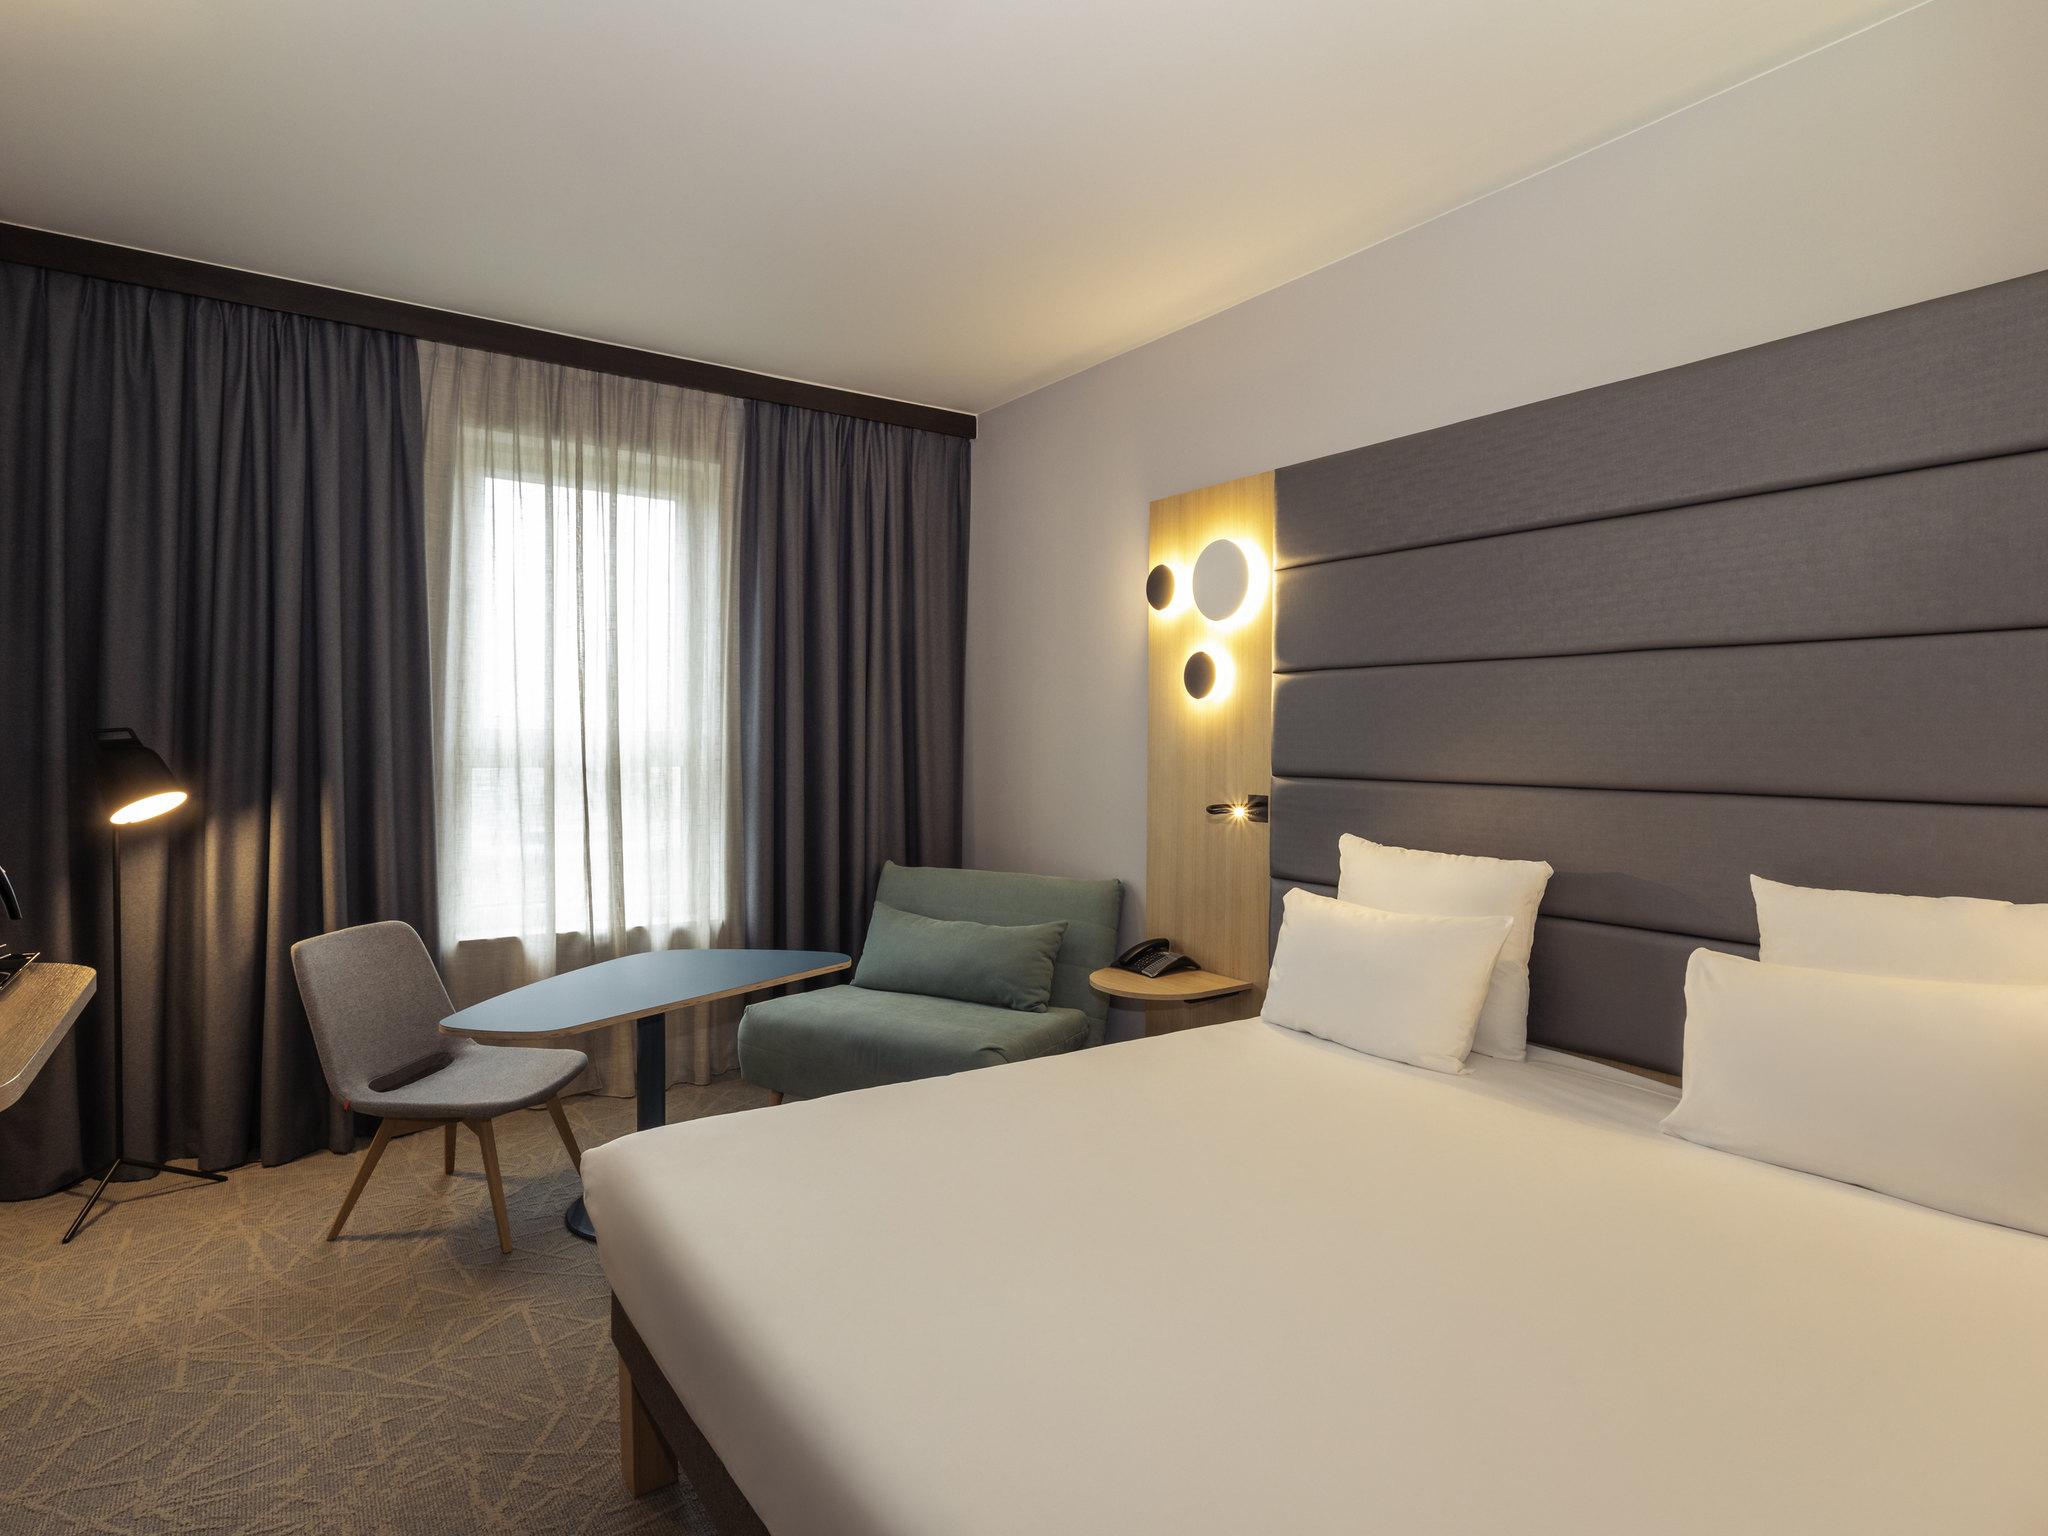 فندق - نوفوتيل Novotel براسيلز سنتر ميدي ستايشن